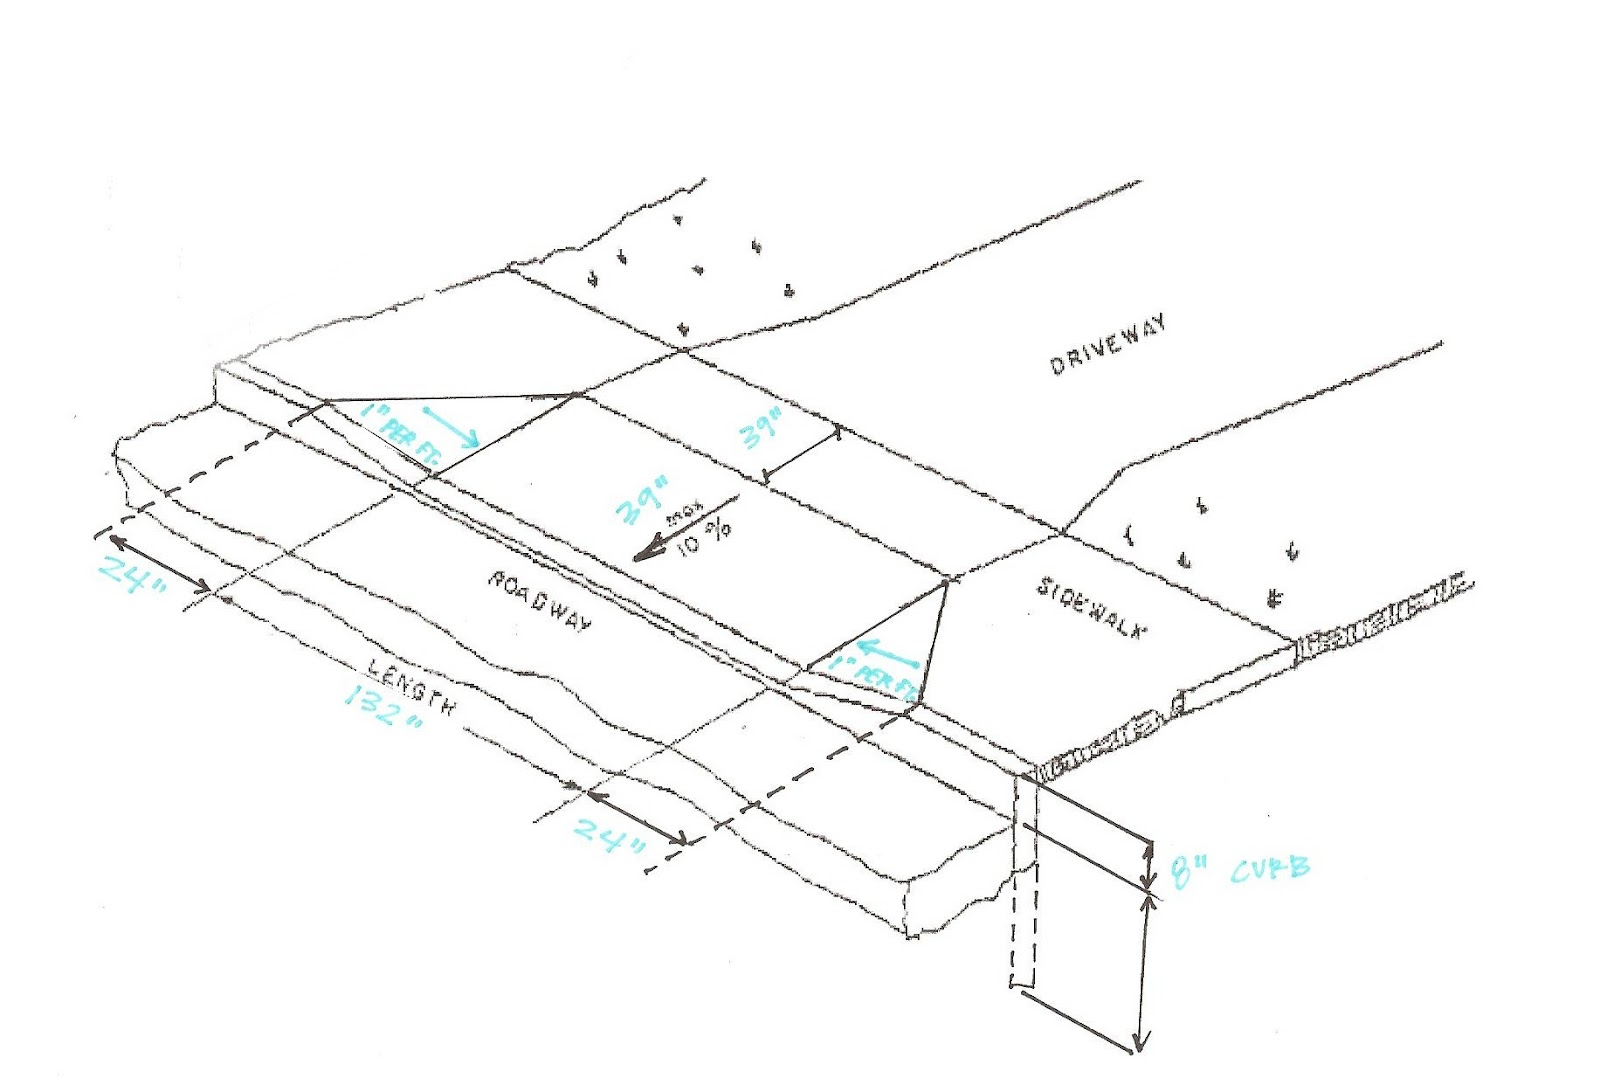 Ariens Ezr 1742 Wiring Diagram additionally 1999 F 53 Motorhome Ignition Wiring in addition Columbia Par Car Wiring Diagram also Ez Loader Trailer Lights Wiring Diagram moreover Motorcycle Cdi Ignition Wiring Diagram. on ramps wiring diagram